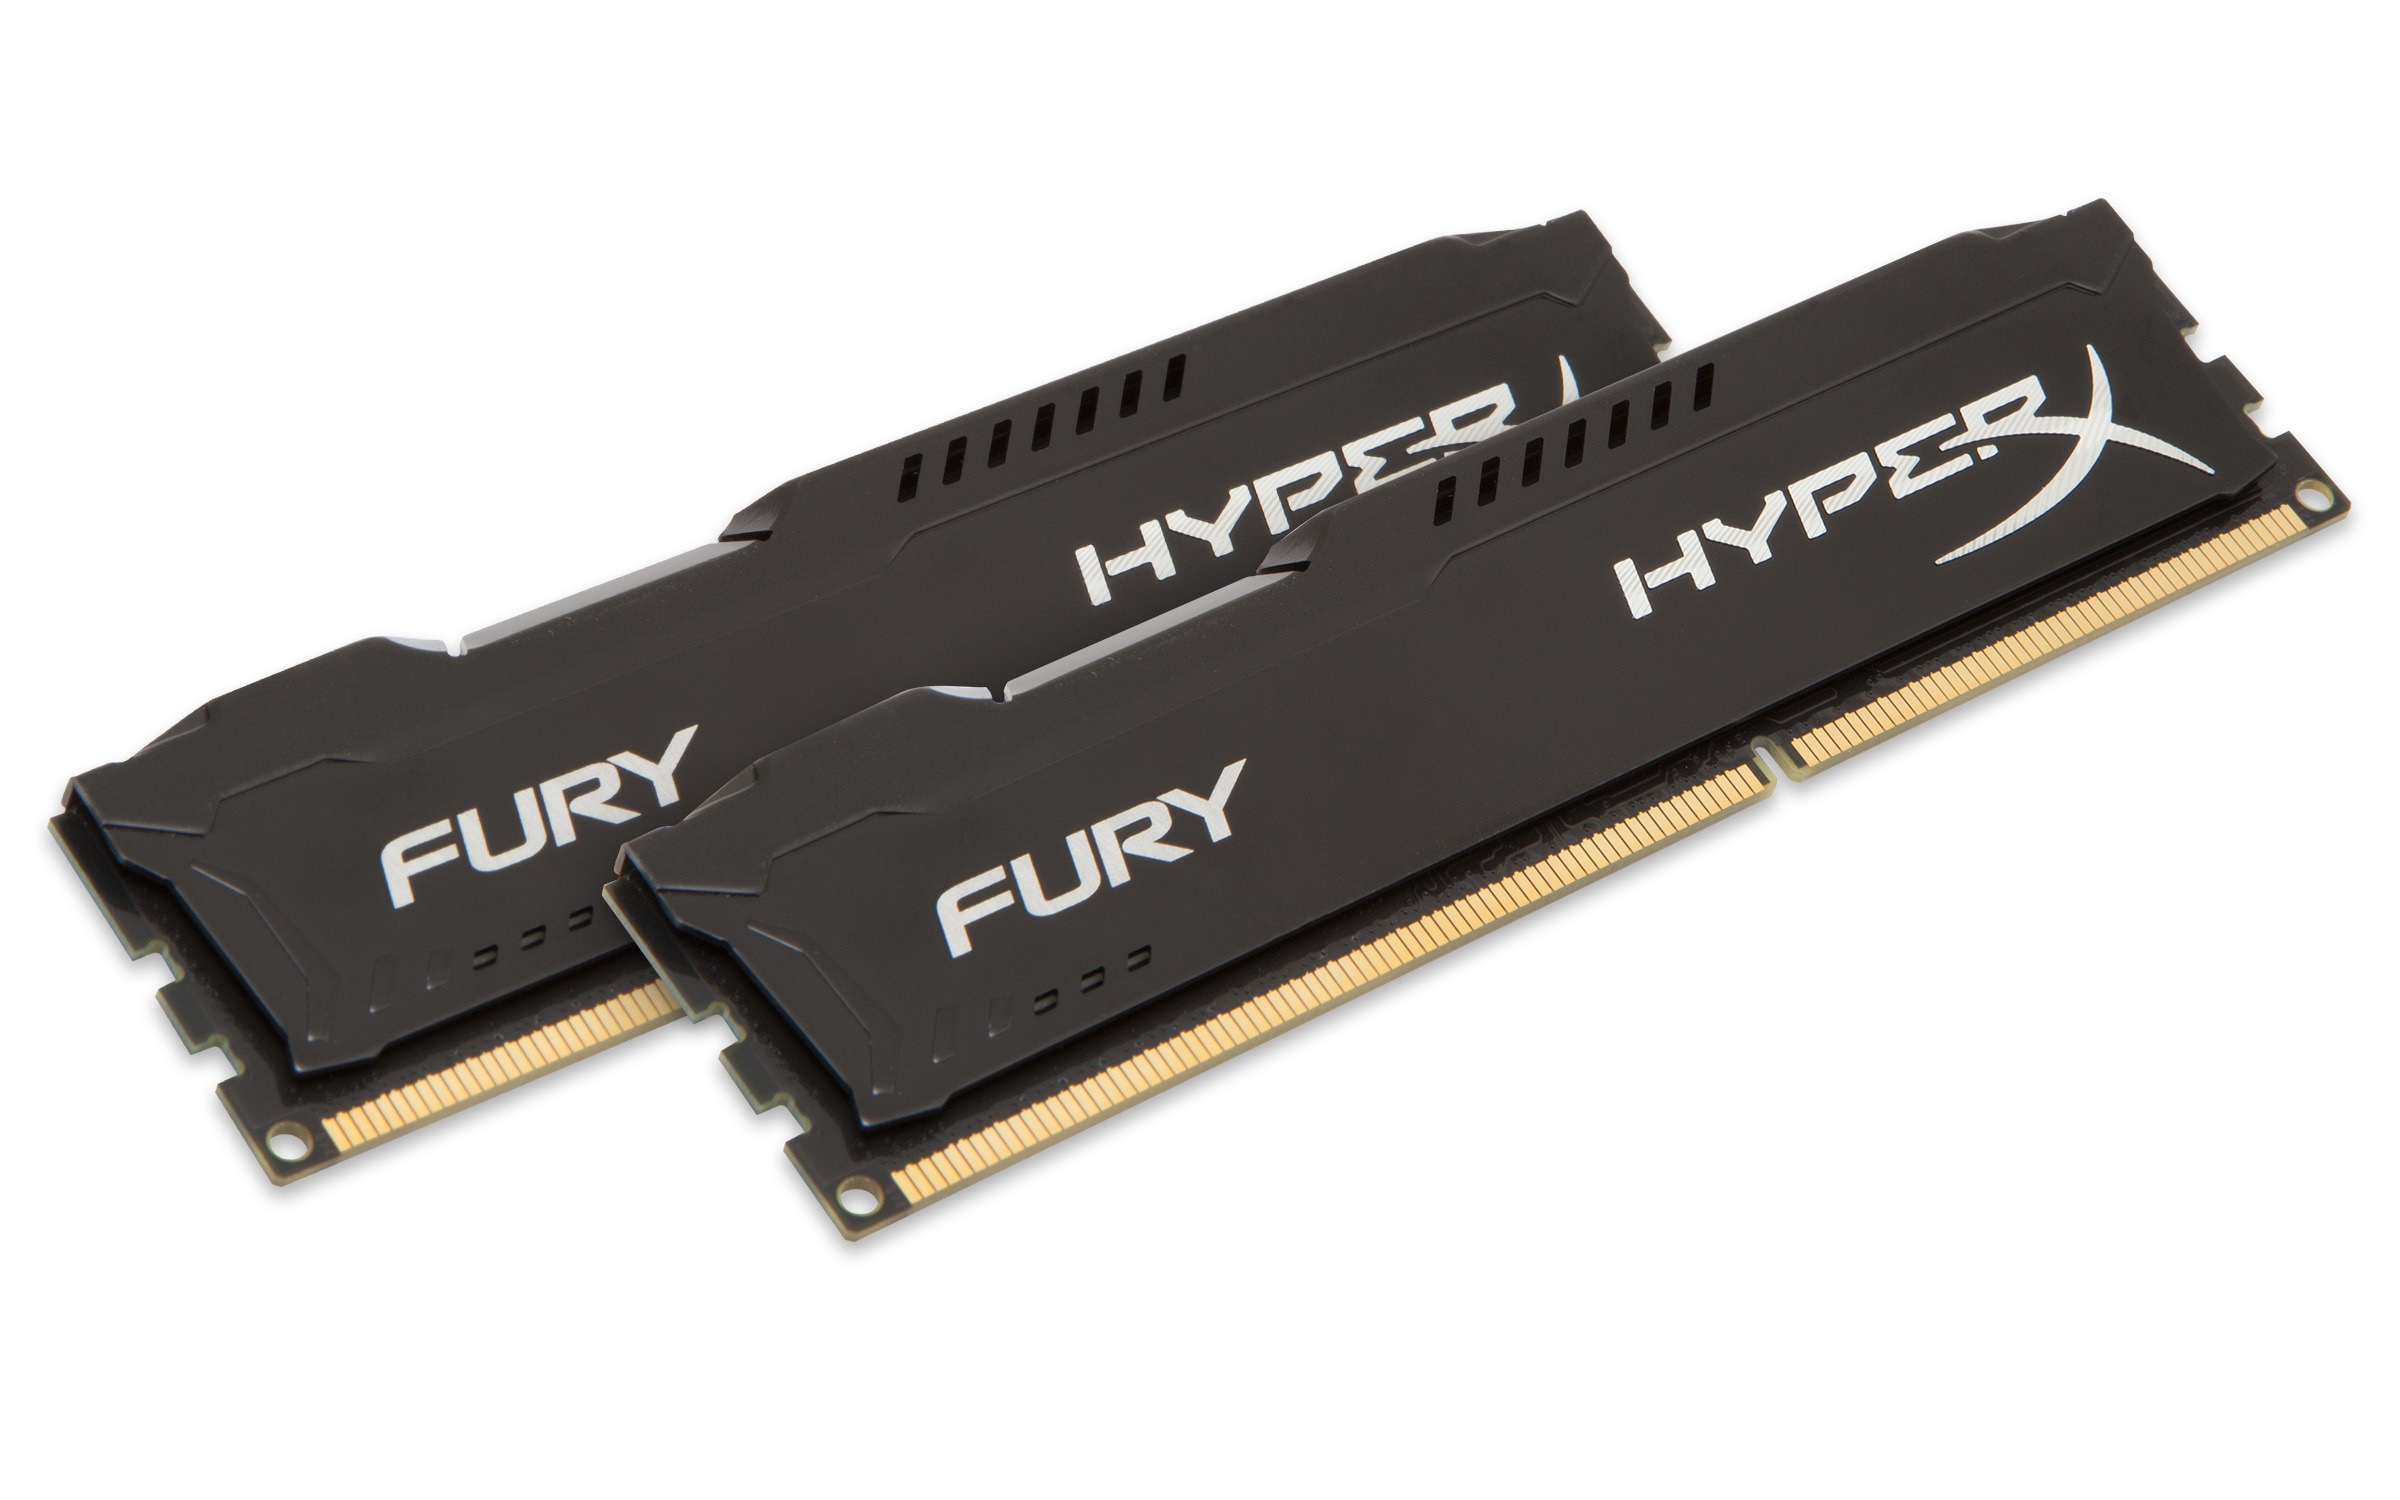 8GB DDR3-1333MHz Kingston HyperX Fury Black, 2x4GB